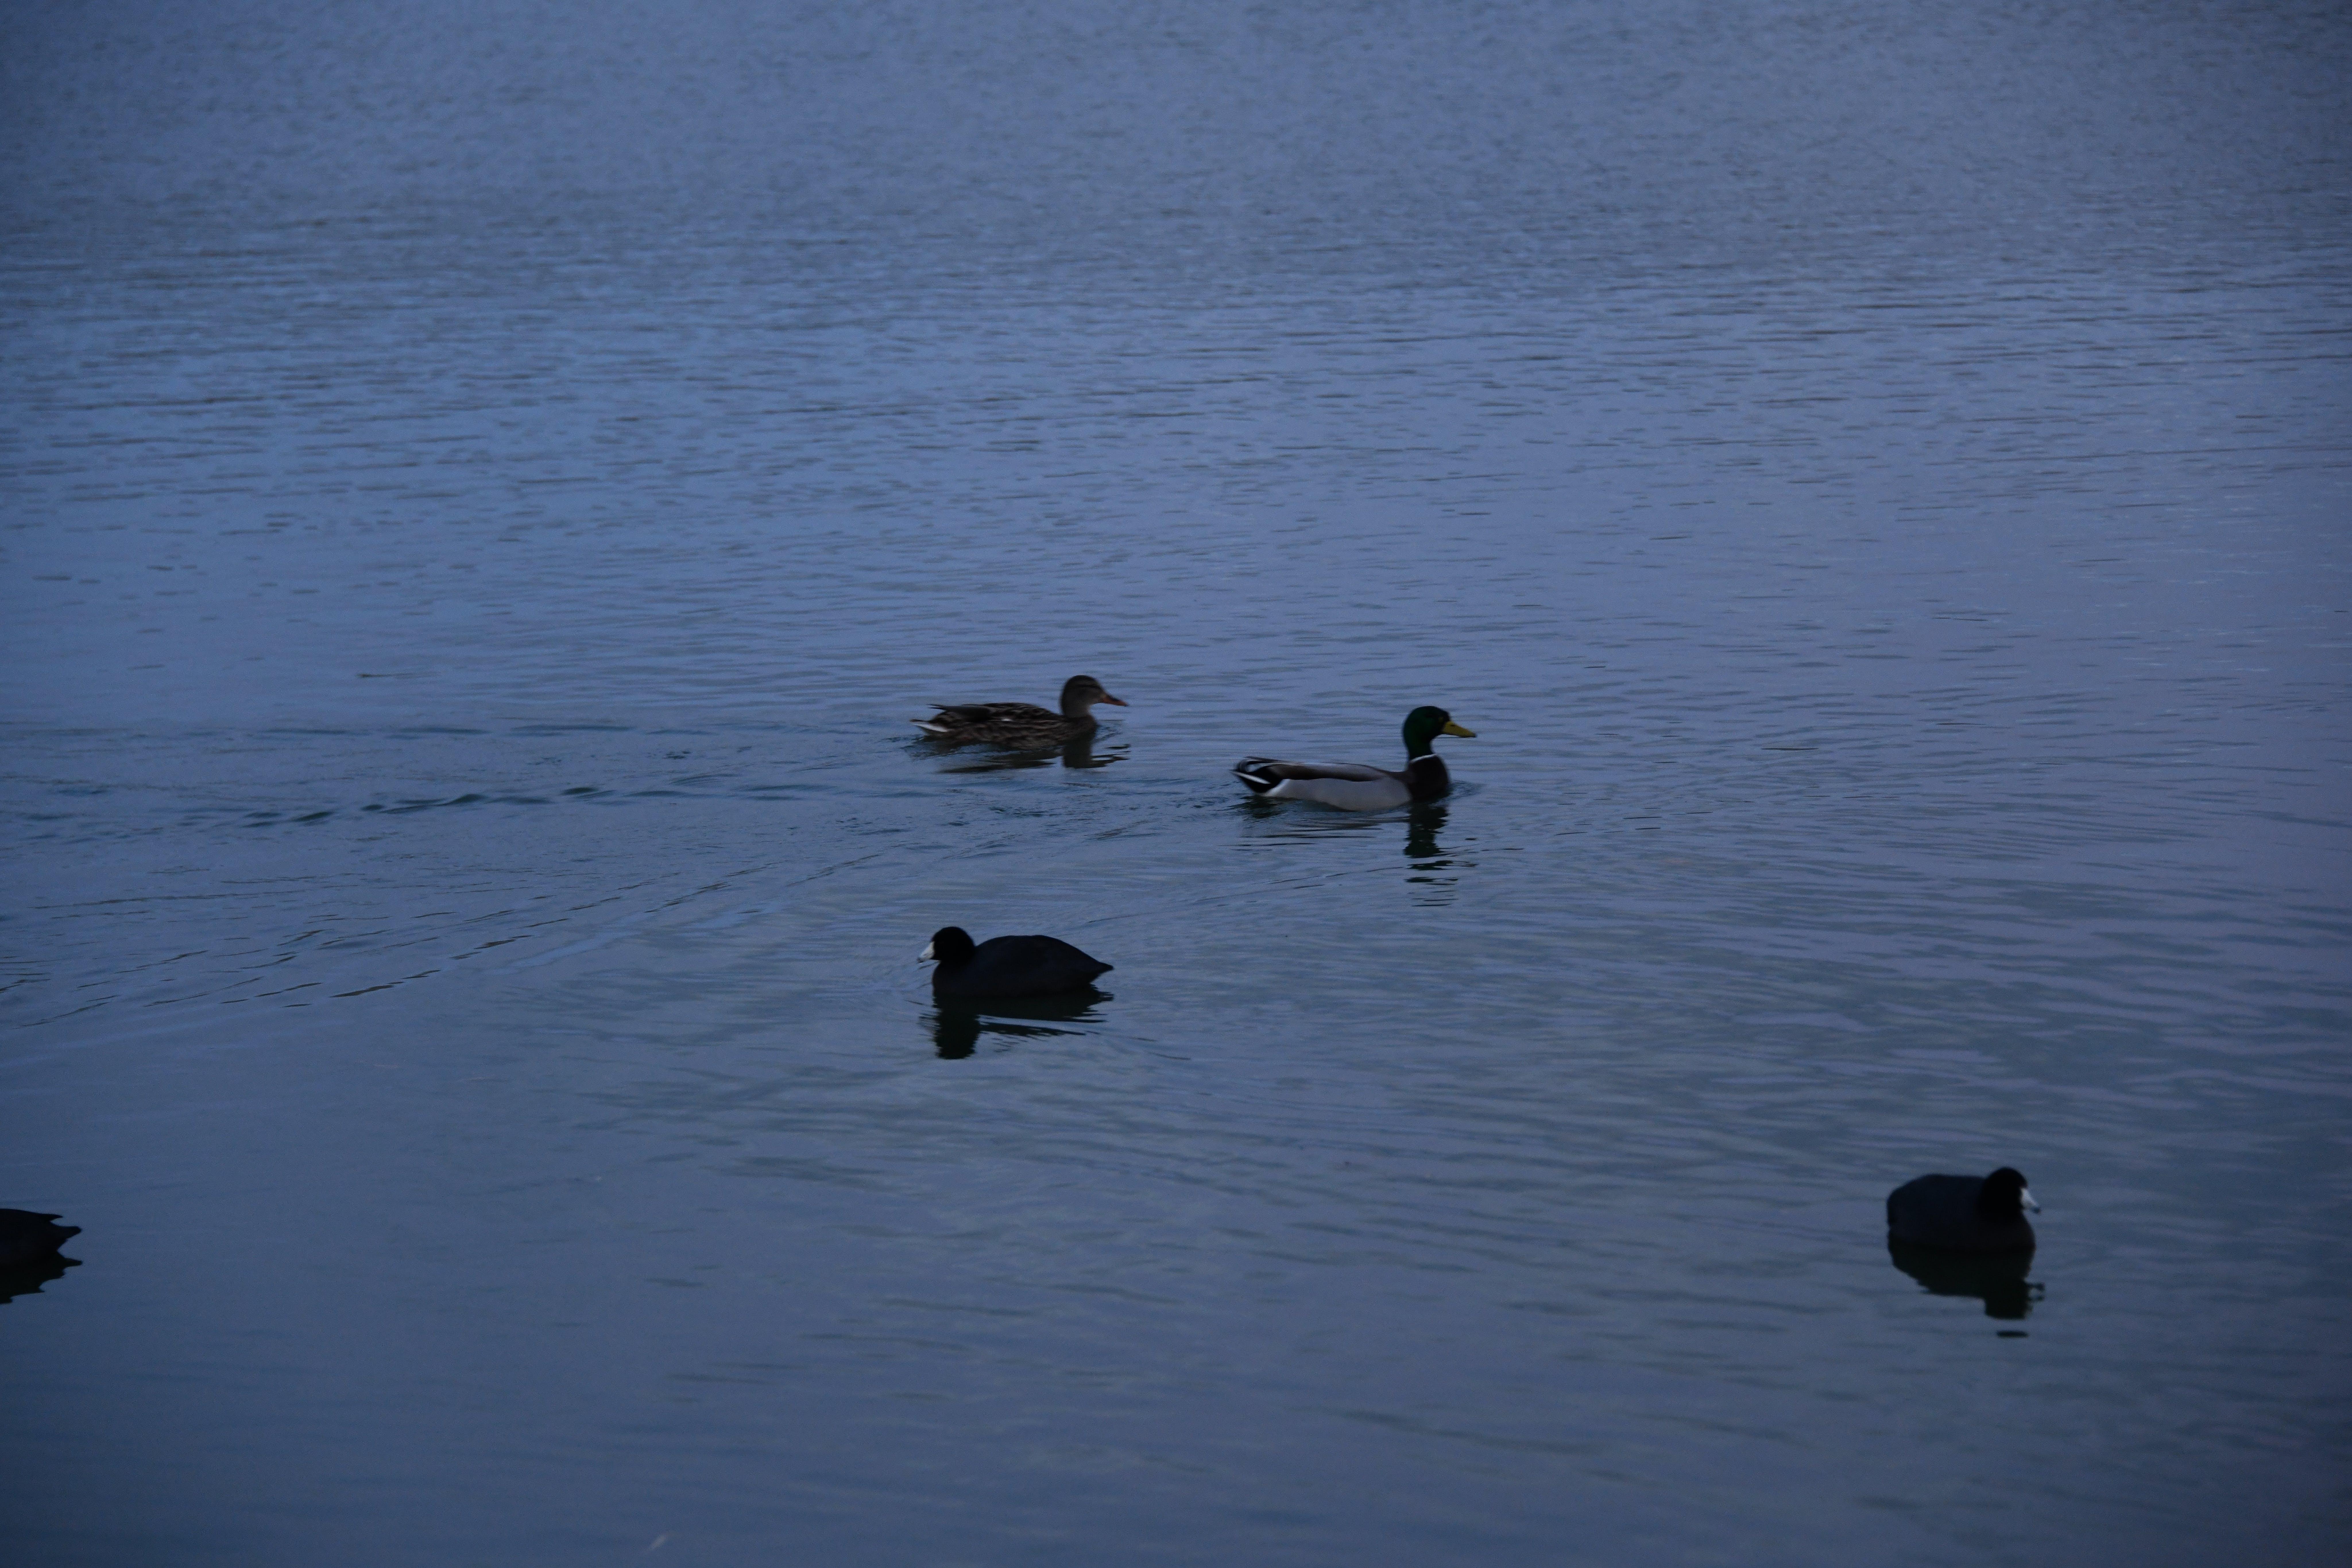 Free stock photo of lake elizabeth ducks